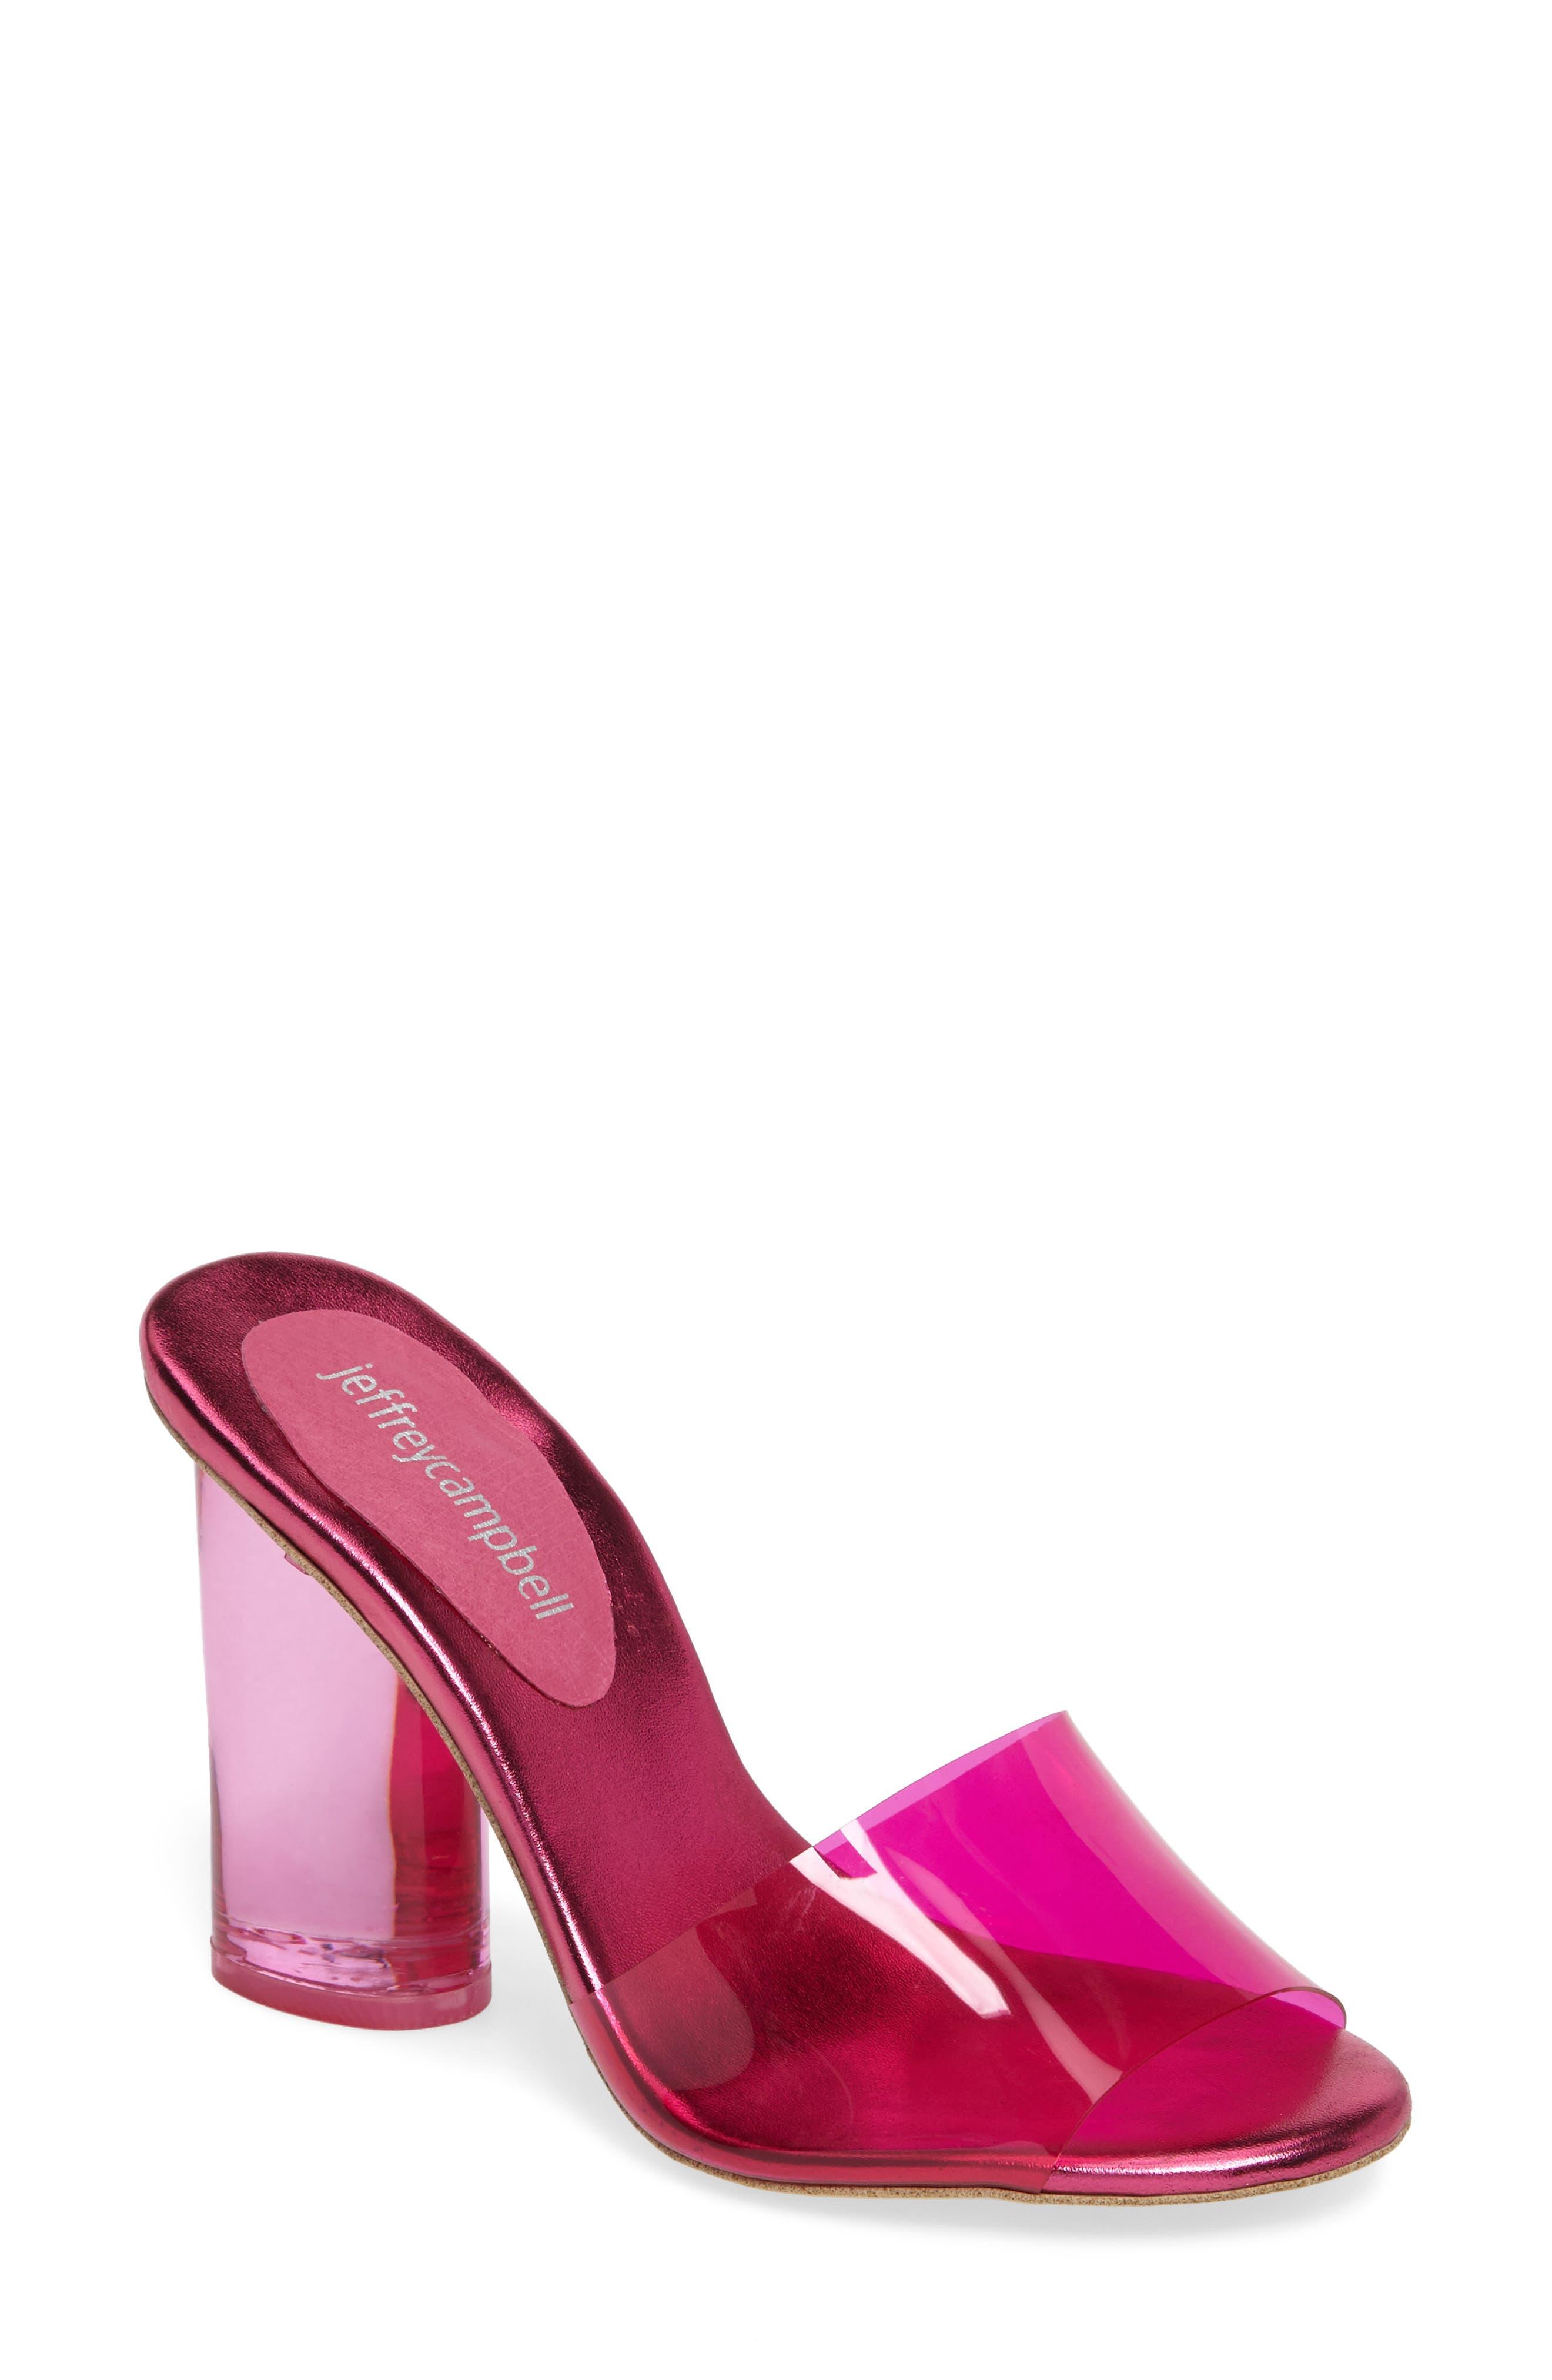 Alternate Image 1 Selected - Jeffrey Campbell Minuit Slide Sandal (Women)